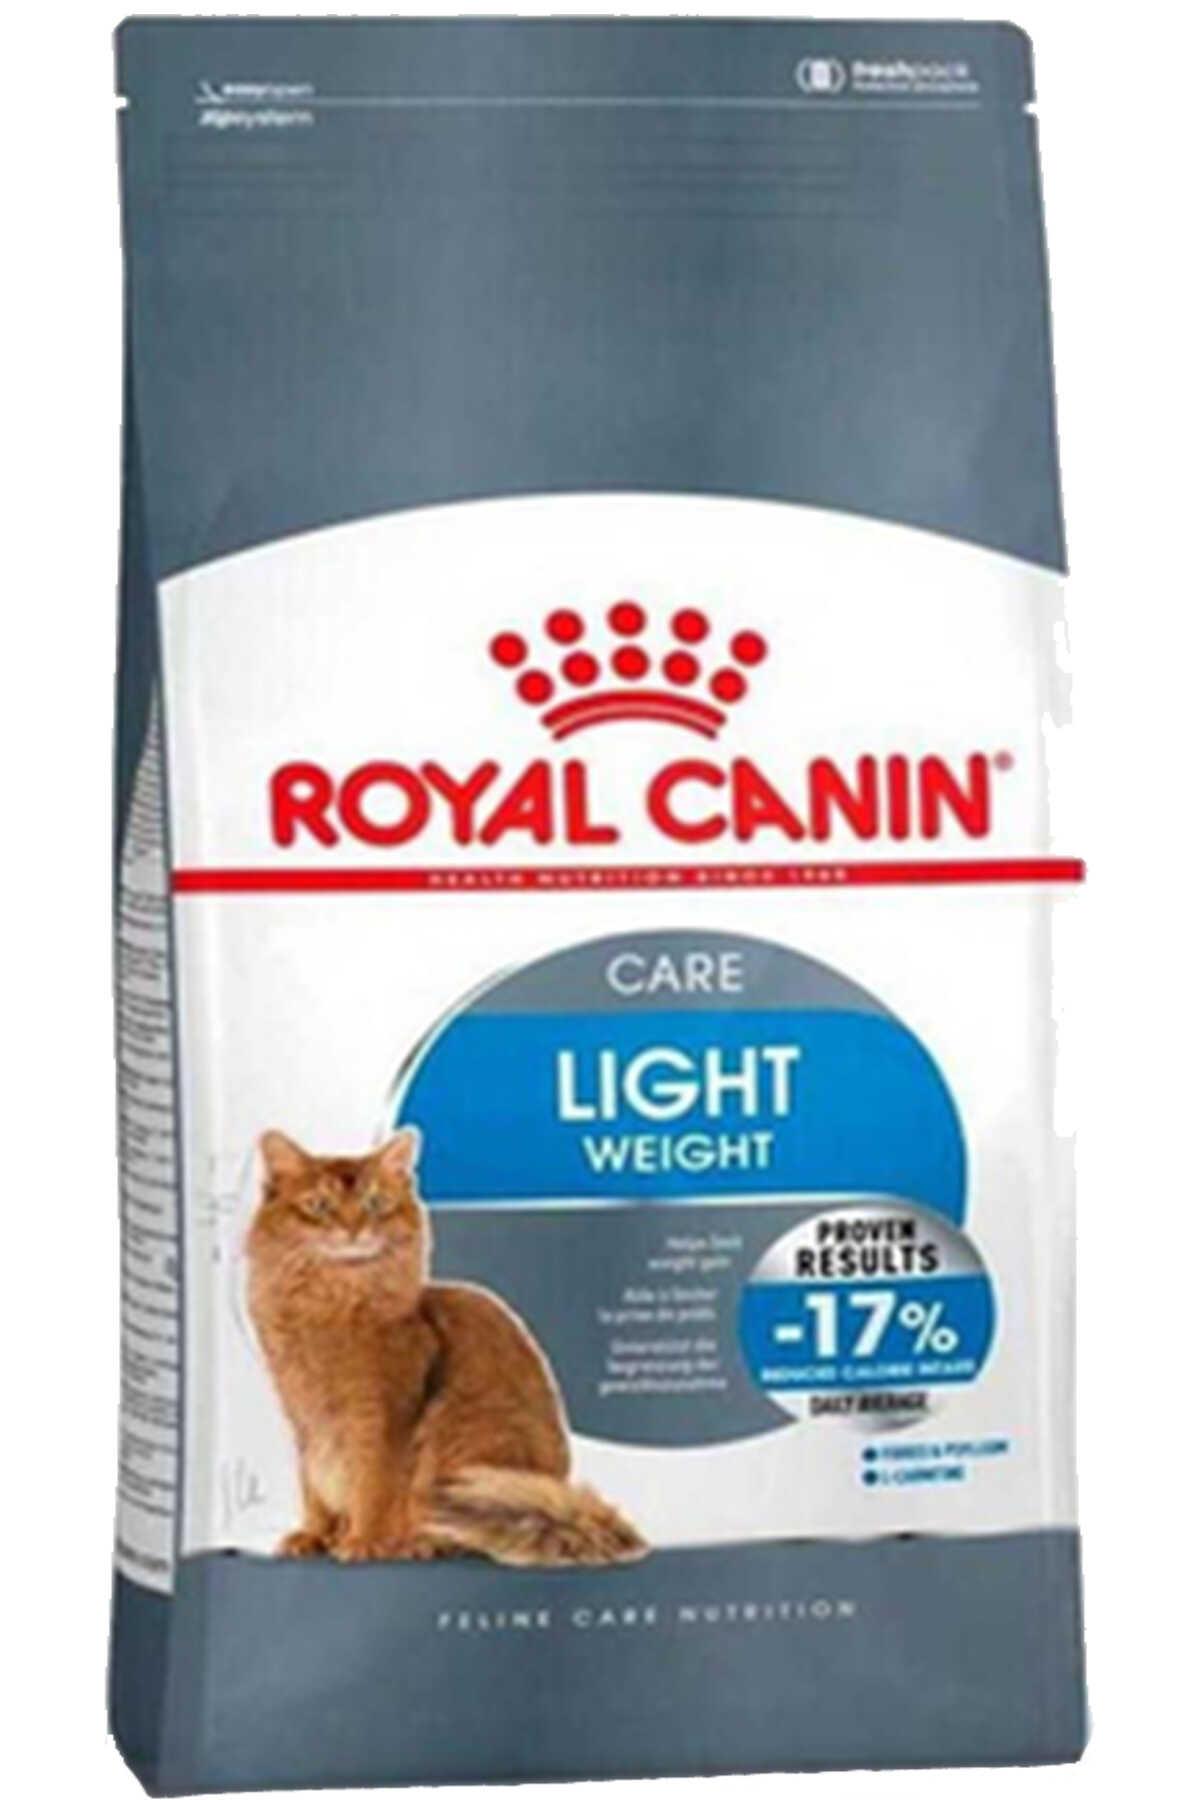 Royal Canin Light Weight Kedi Maması 8kg